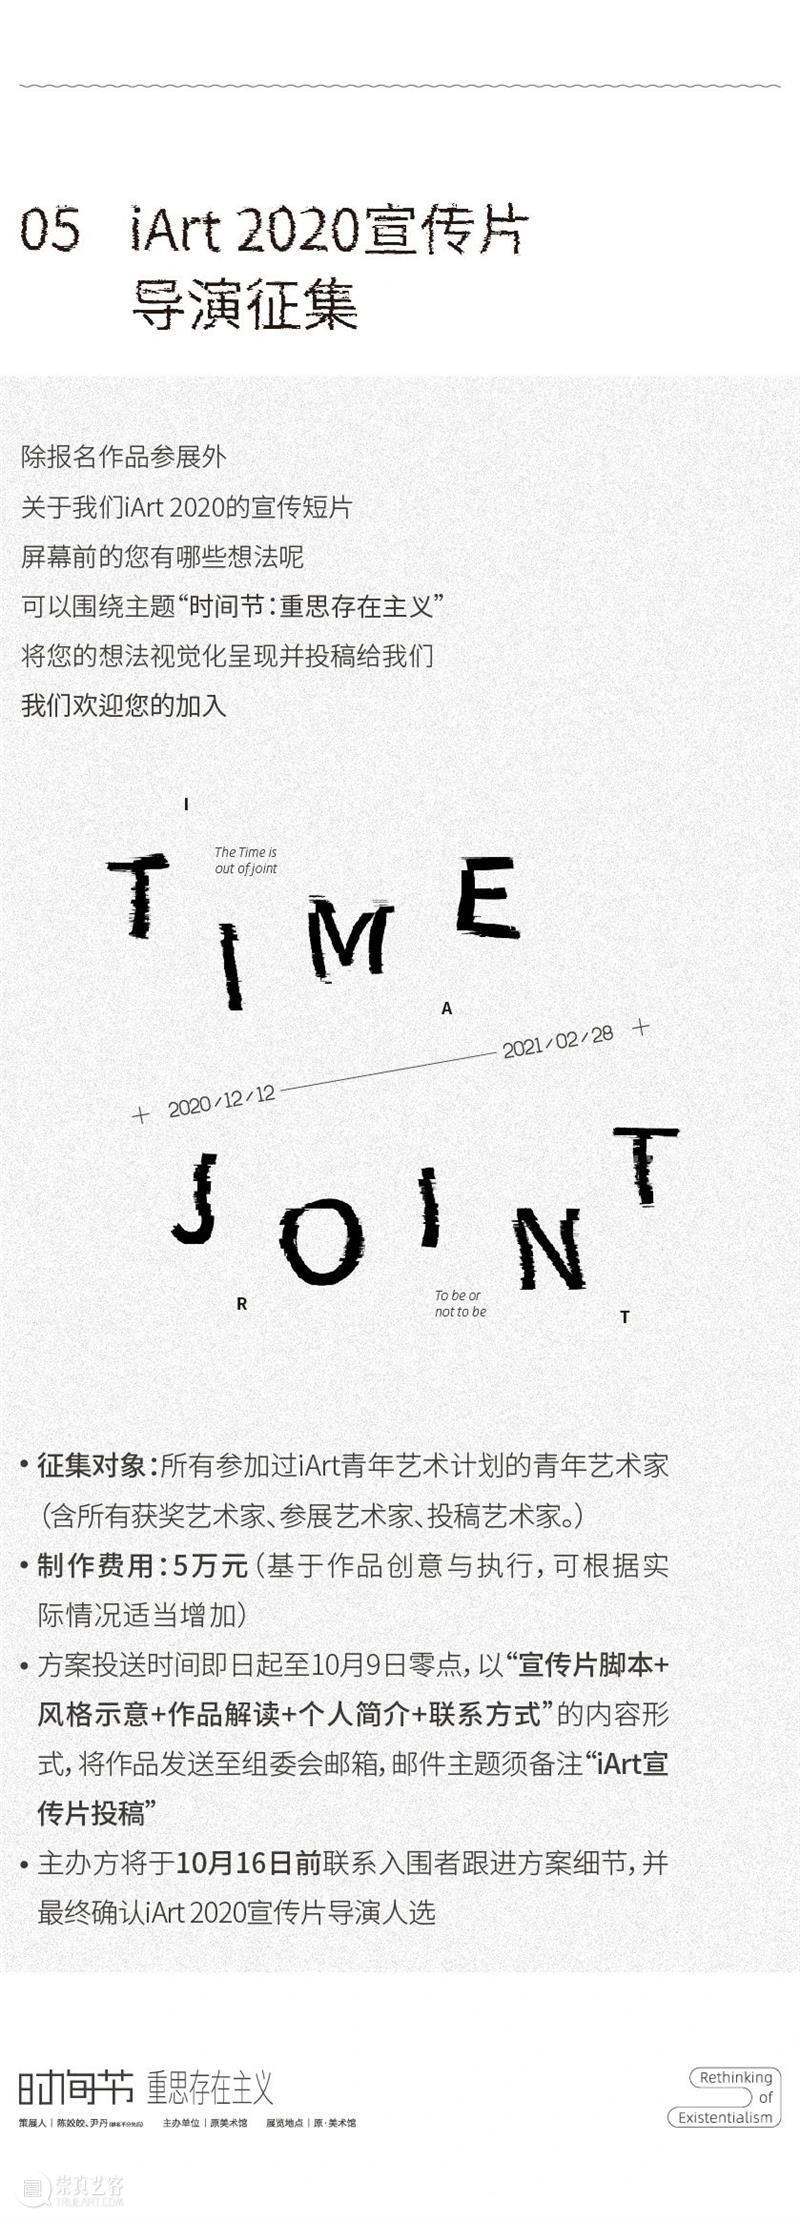 【iArt 青年艺术计划】2020全球征集:重新思考,重启时间 艺术 iArt 青年 计划 全球 时间 扫码 美术馆 社群 空间 崇真艺客